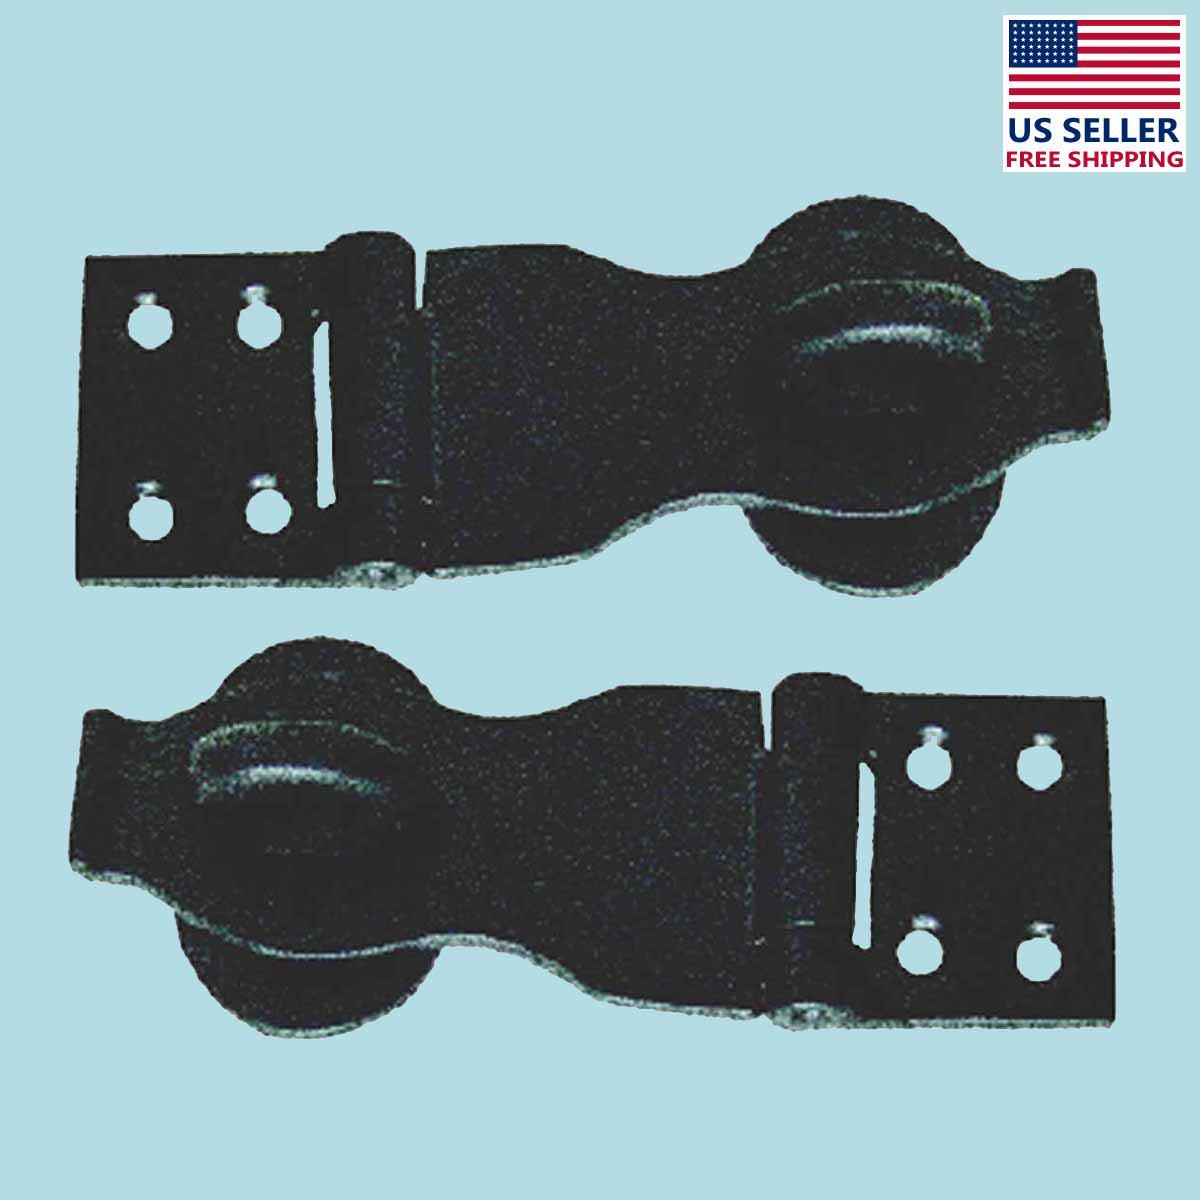 2 Hasps Black Wrought Iron Rustproof Set of 2   Renovators Supply 2